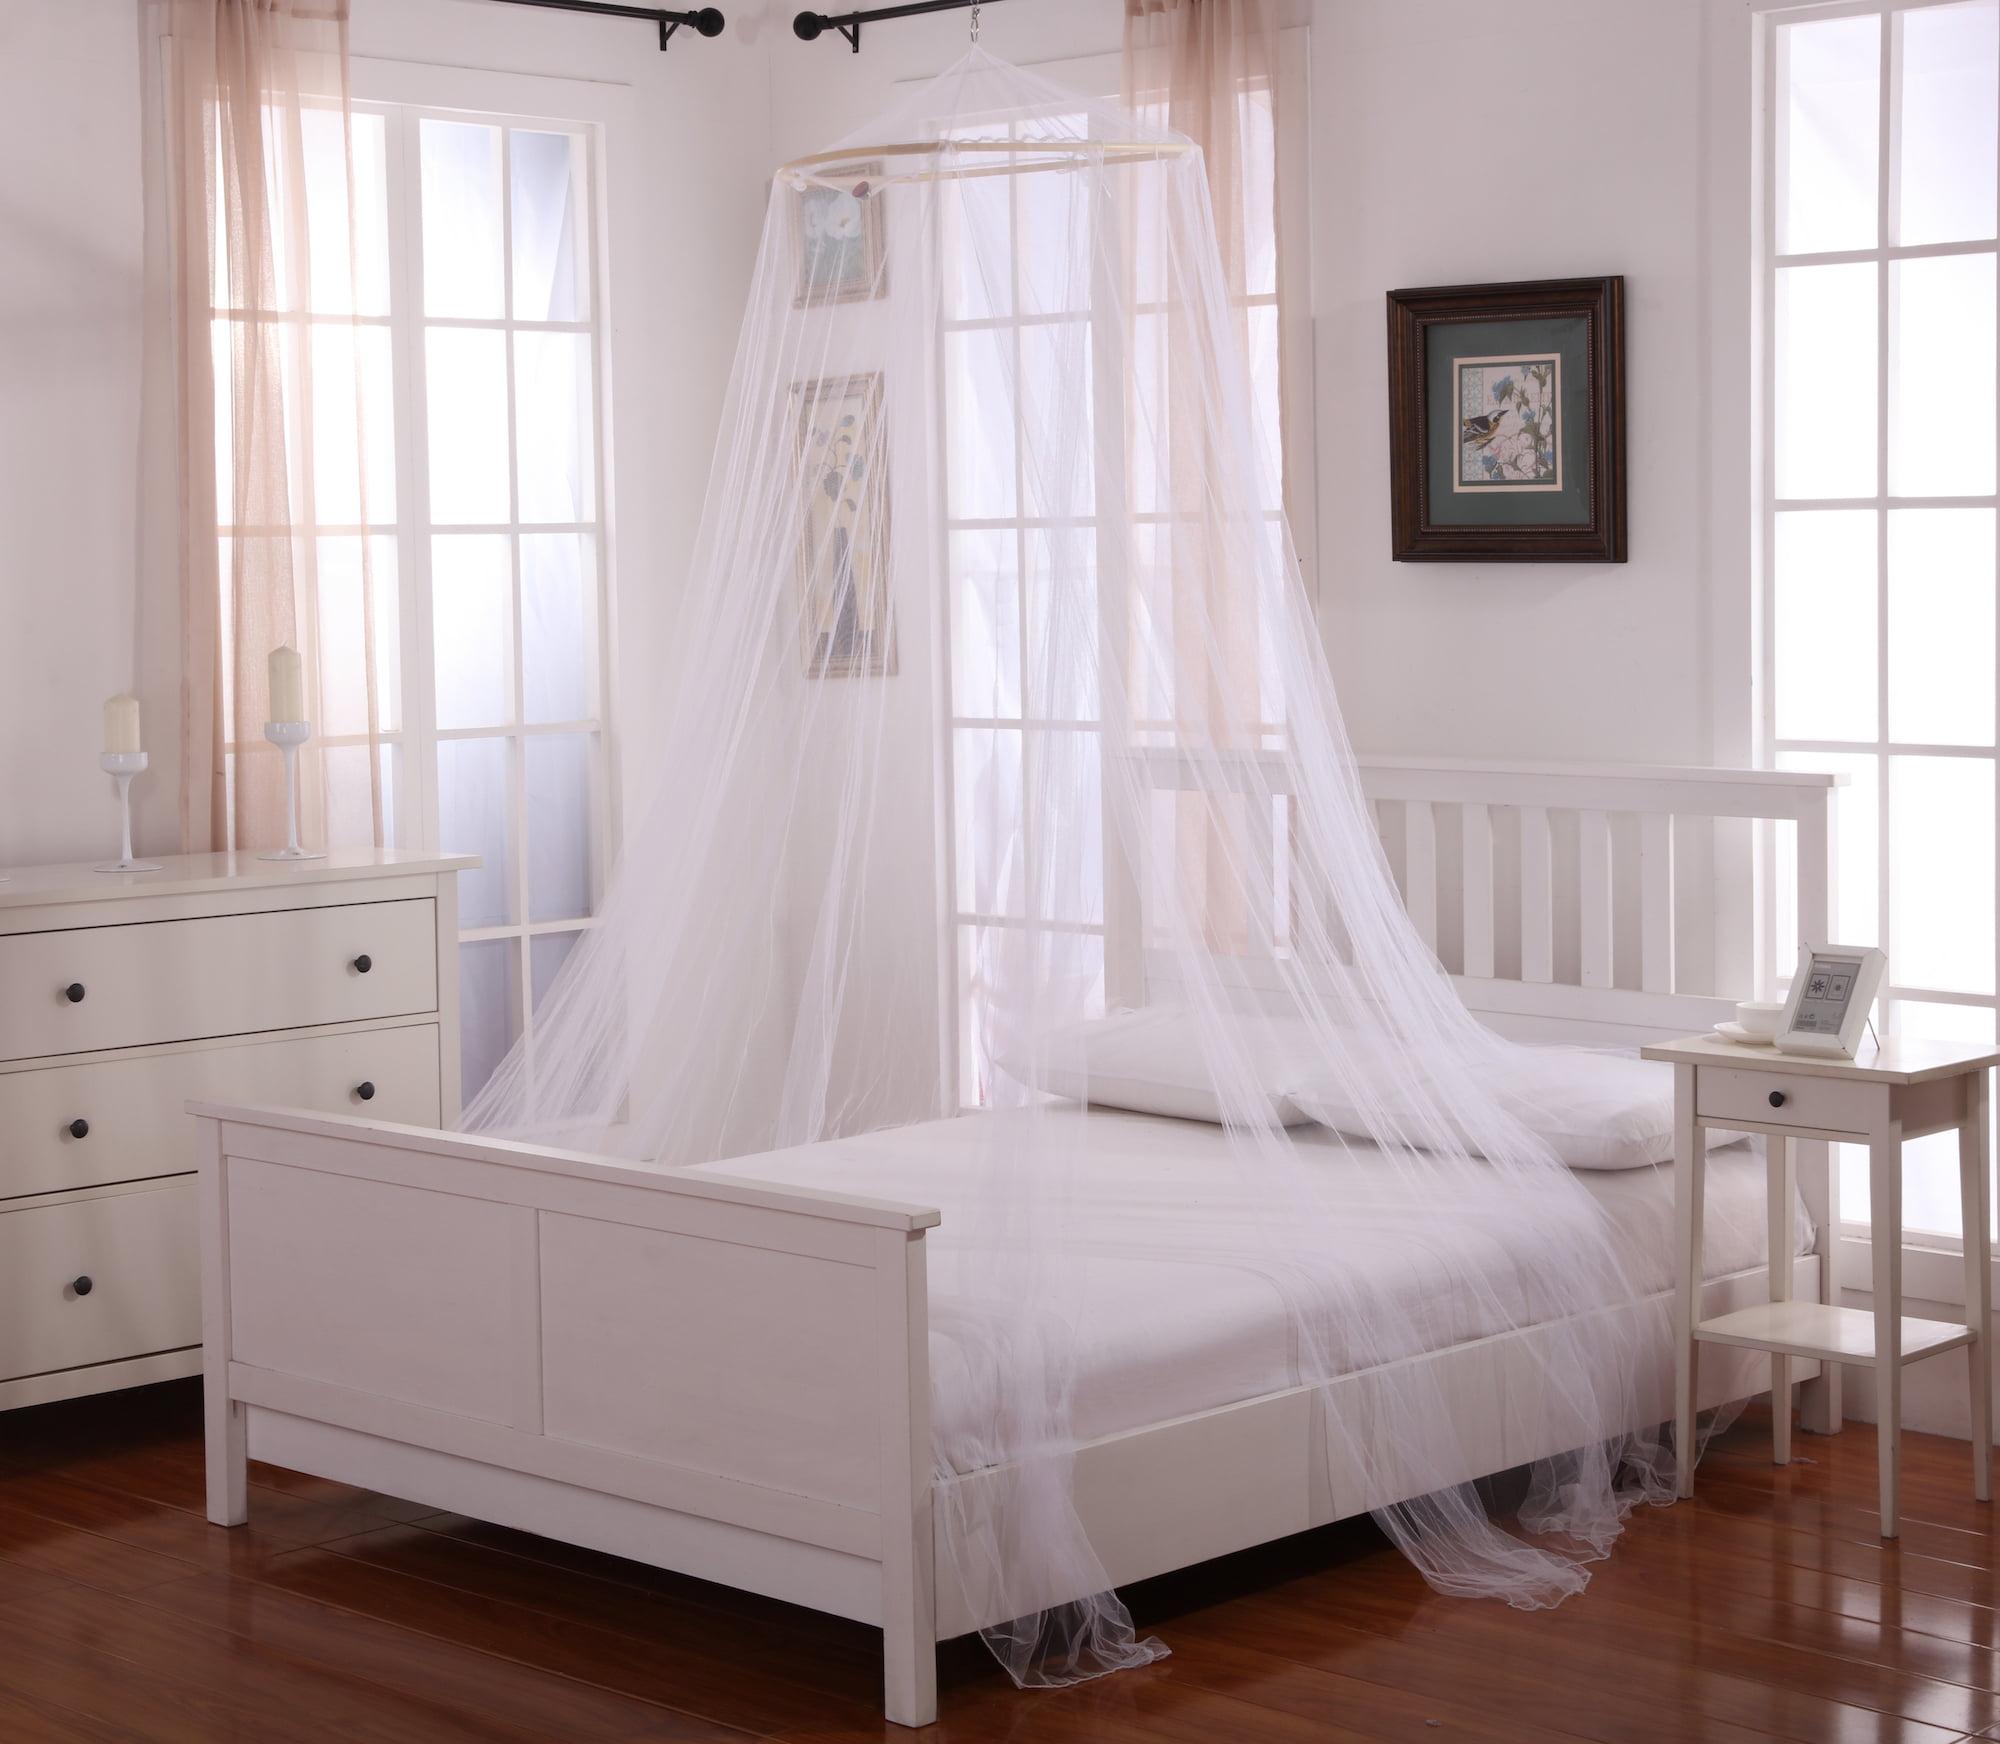 Oasis Round Hoop Polyester Sheer Mosquito Netting Bed Canopy Walmart Com Walmart Com